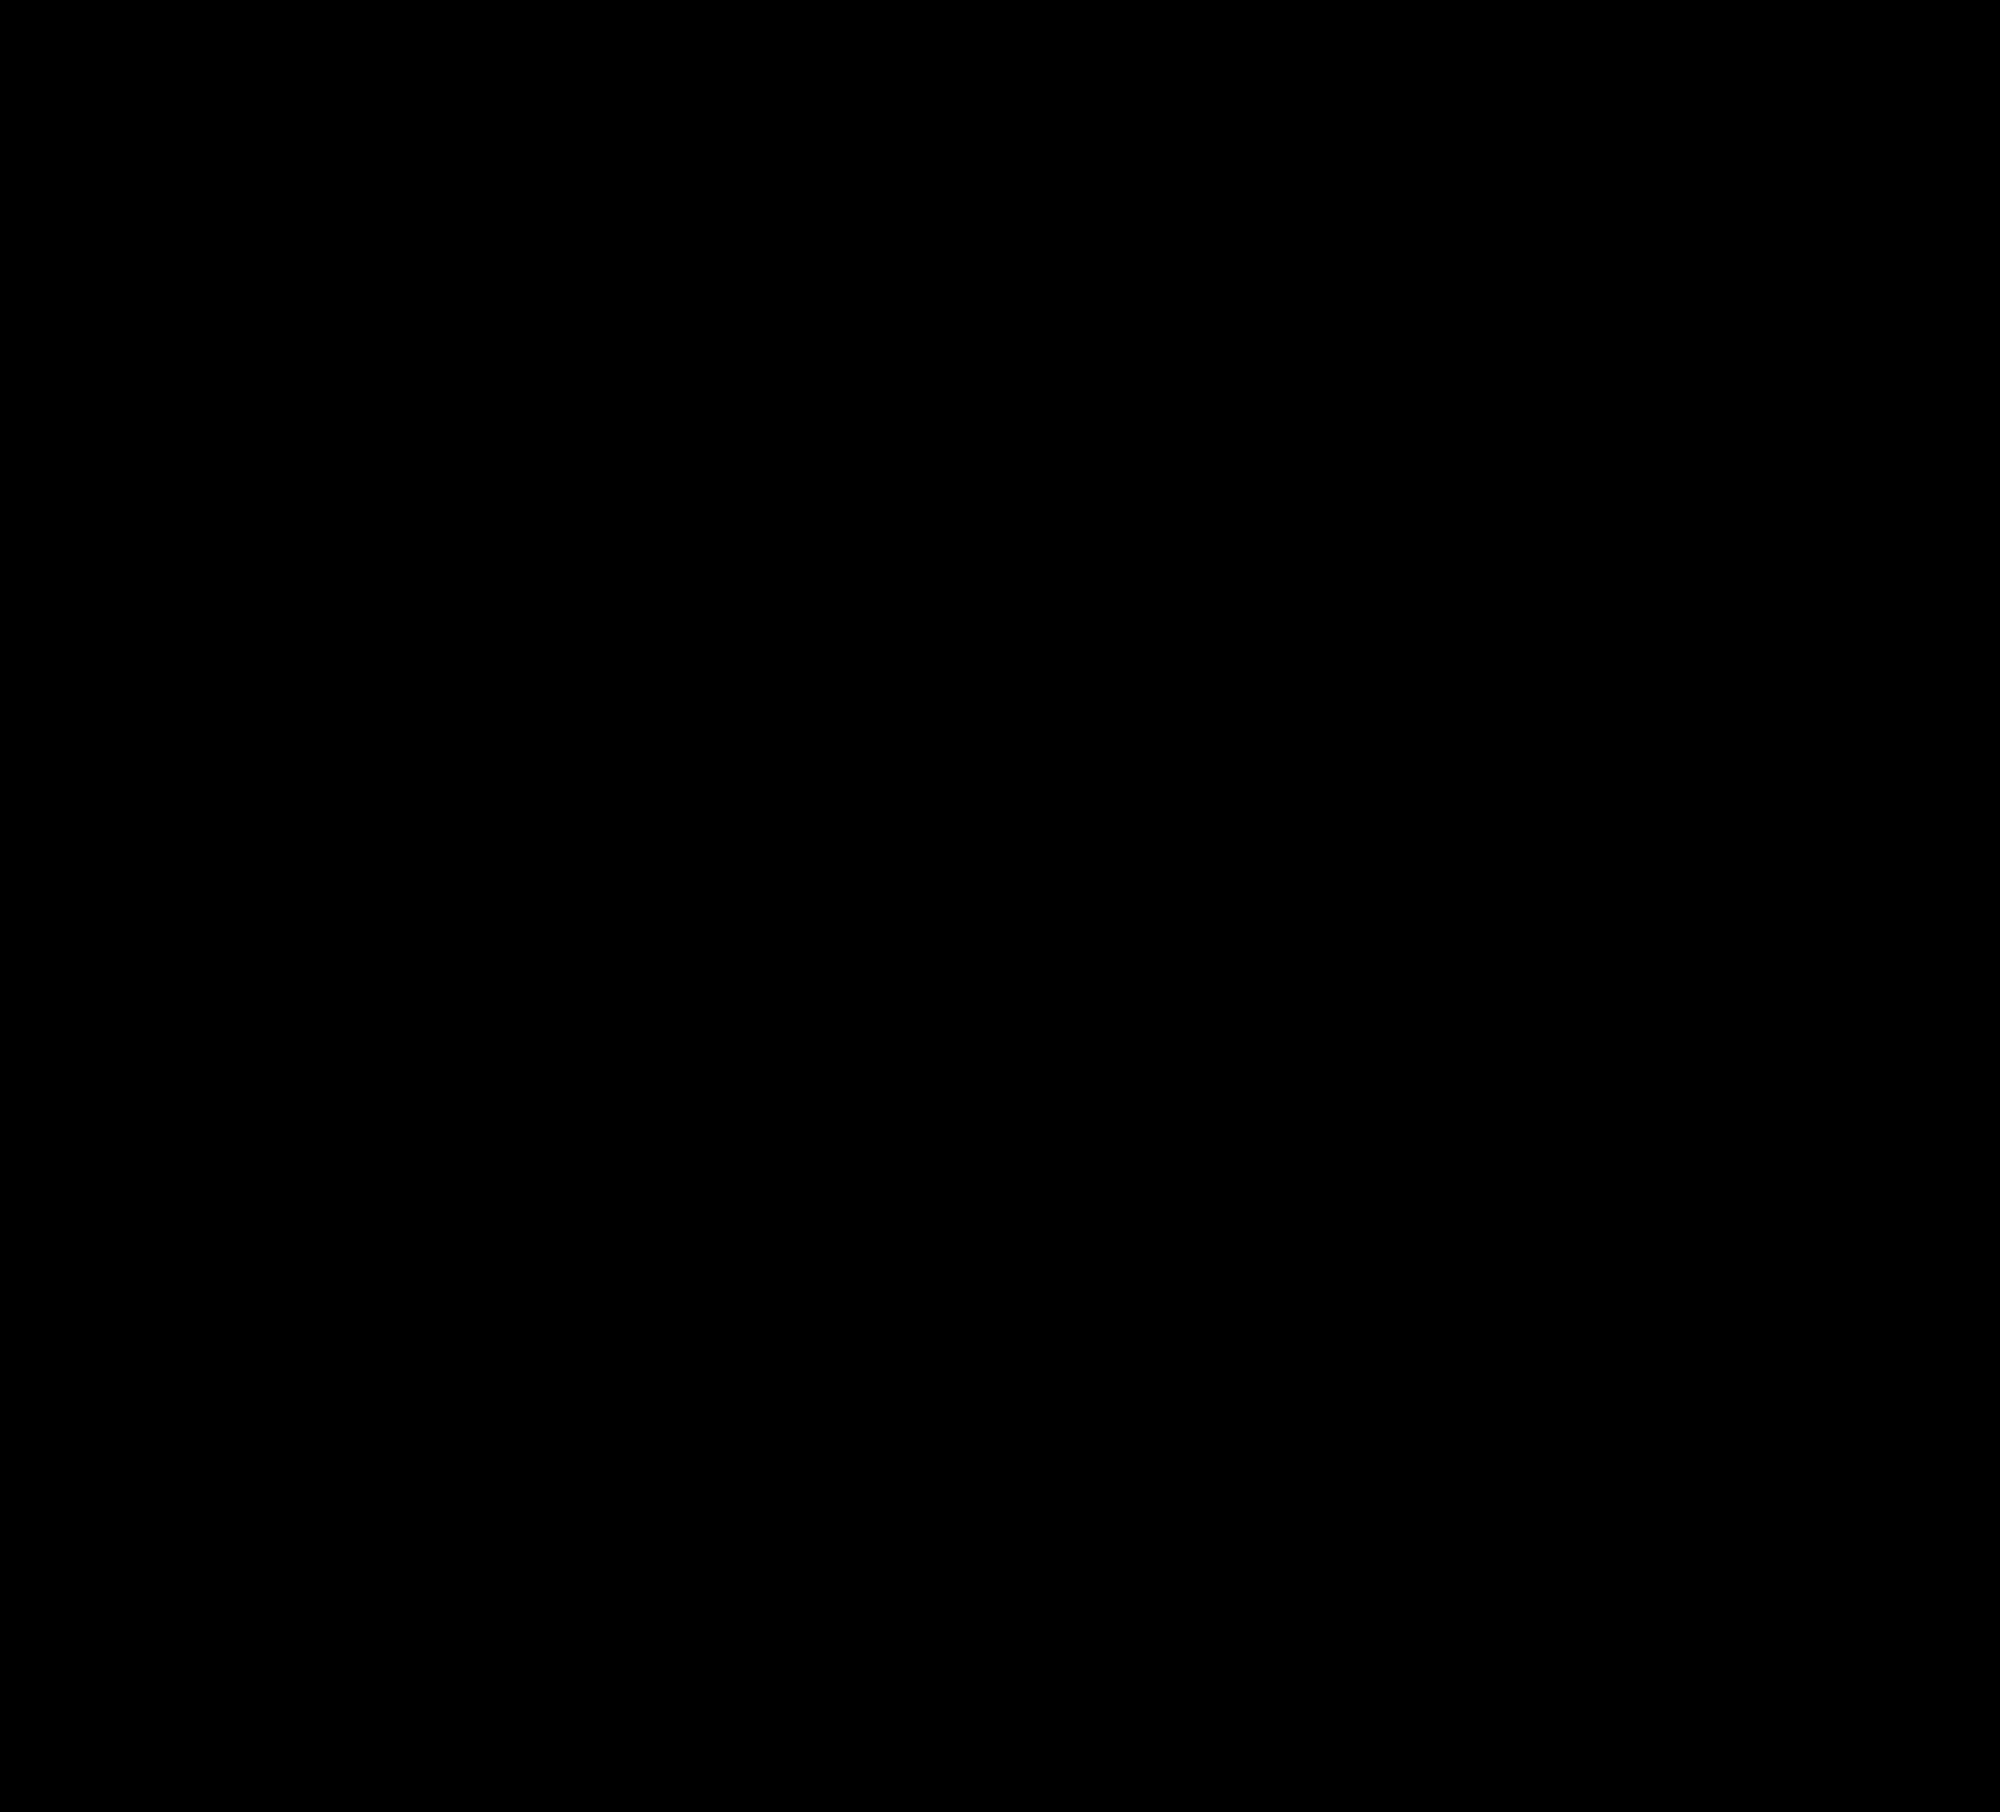 Logo_Rüsterei_2000px_rgb.png